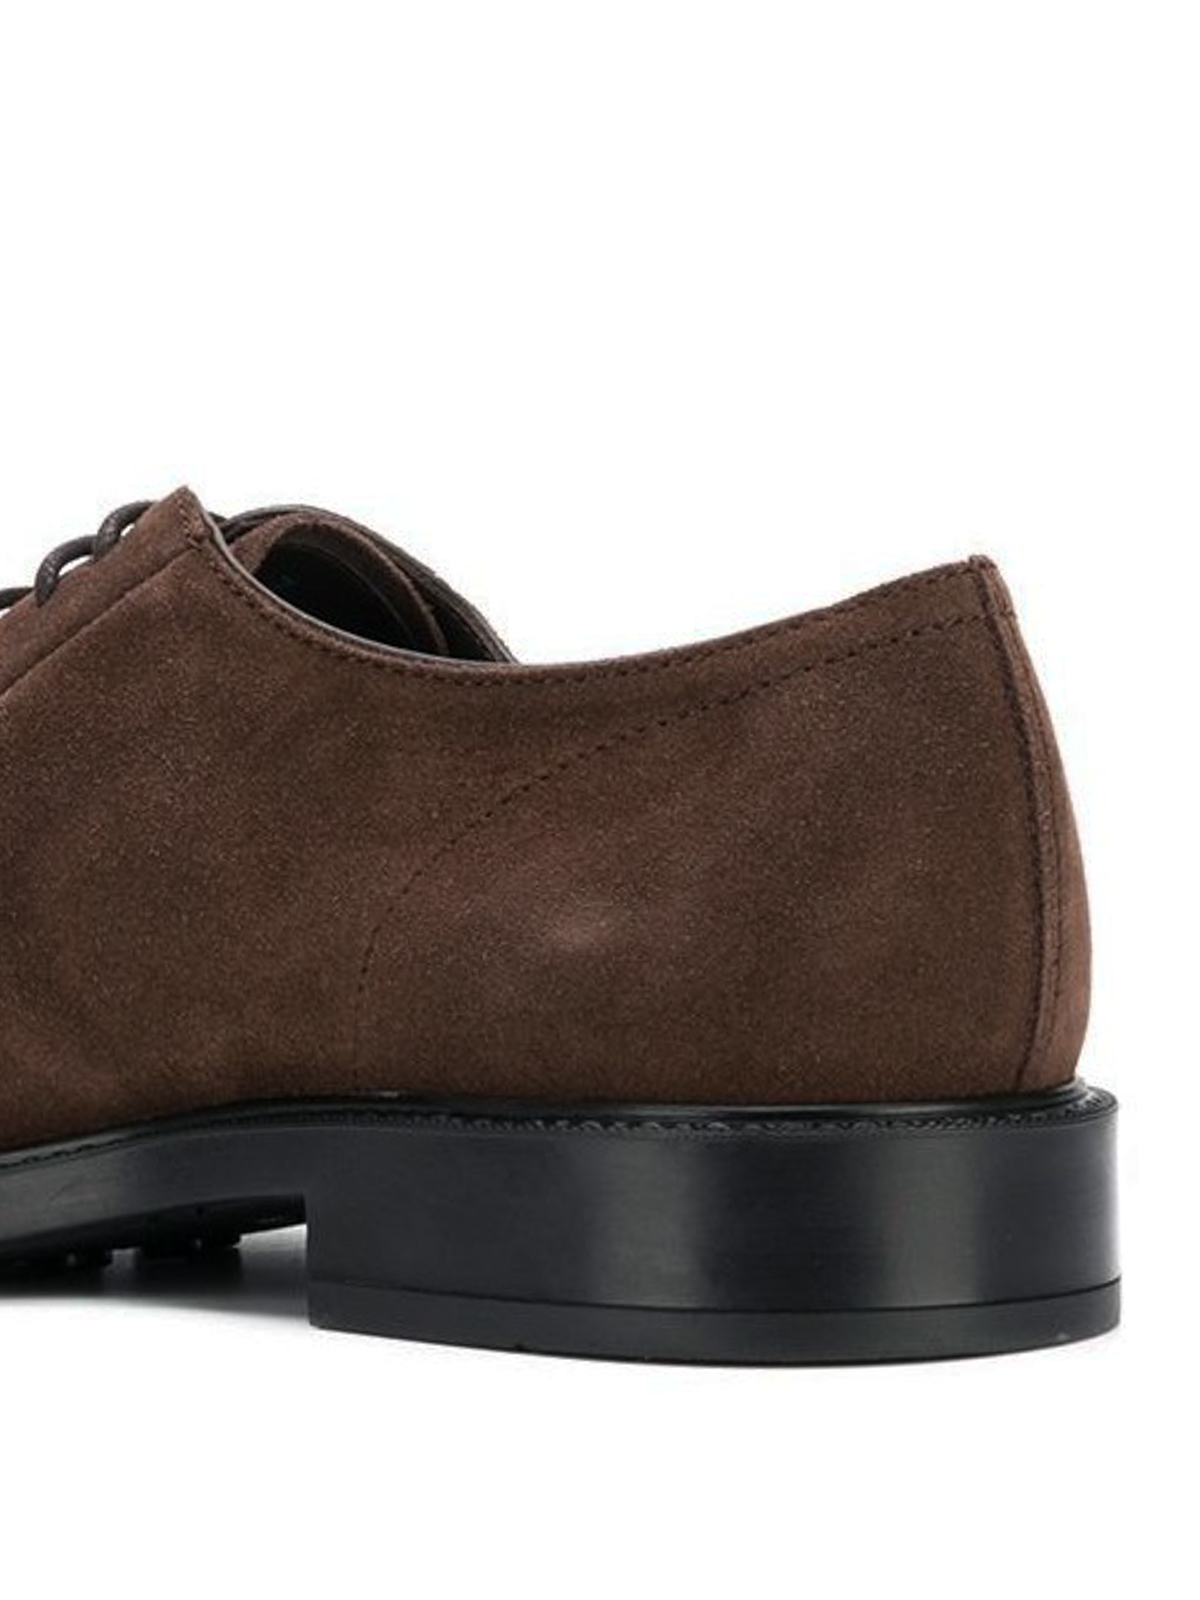 935462d7d2c100 Tod'S - Derby stringate in camoscio marrone - scarpe stringate ...